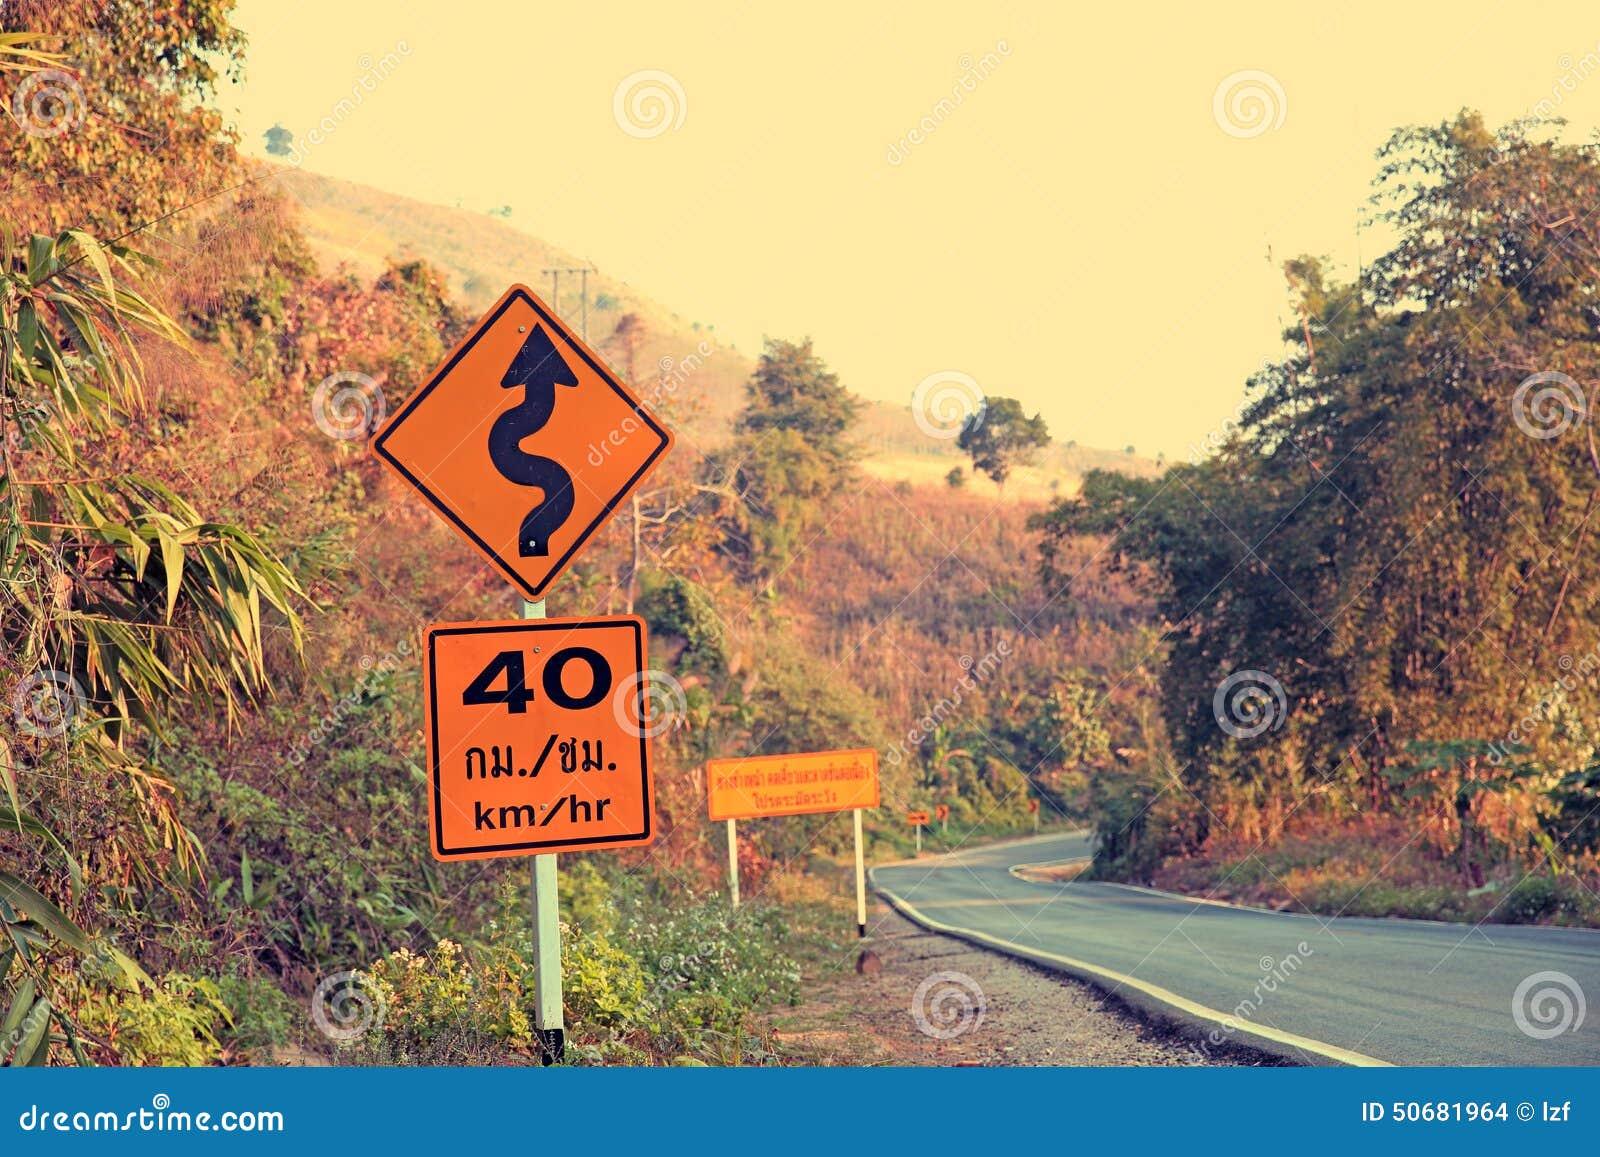 Download 在曲线山路旁边的路标 库存照片. 图片 包括有 围攻, 业务量, 老挝, 摩托车, 锋利, 没人, 室外 - 50681964